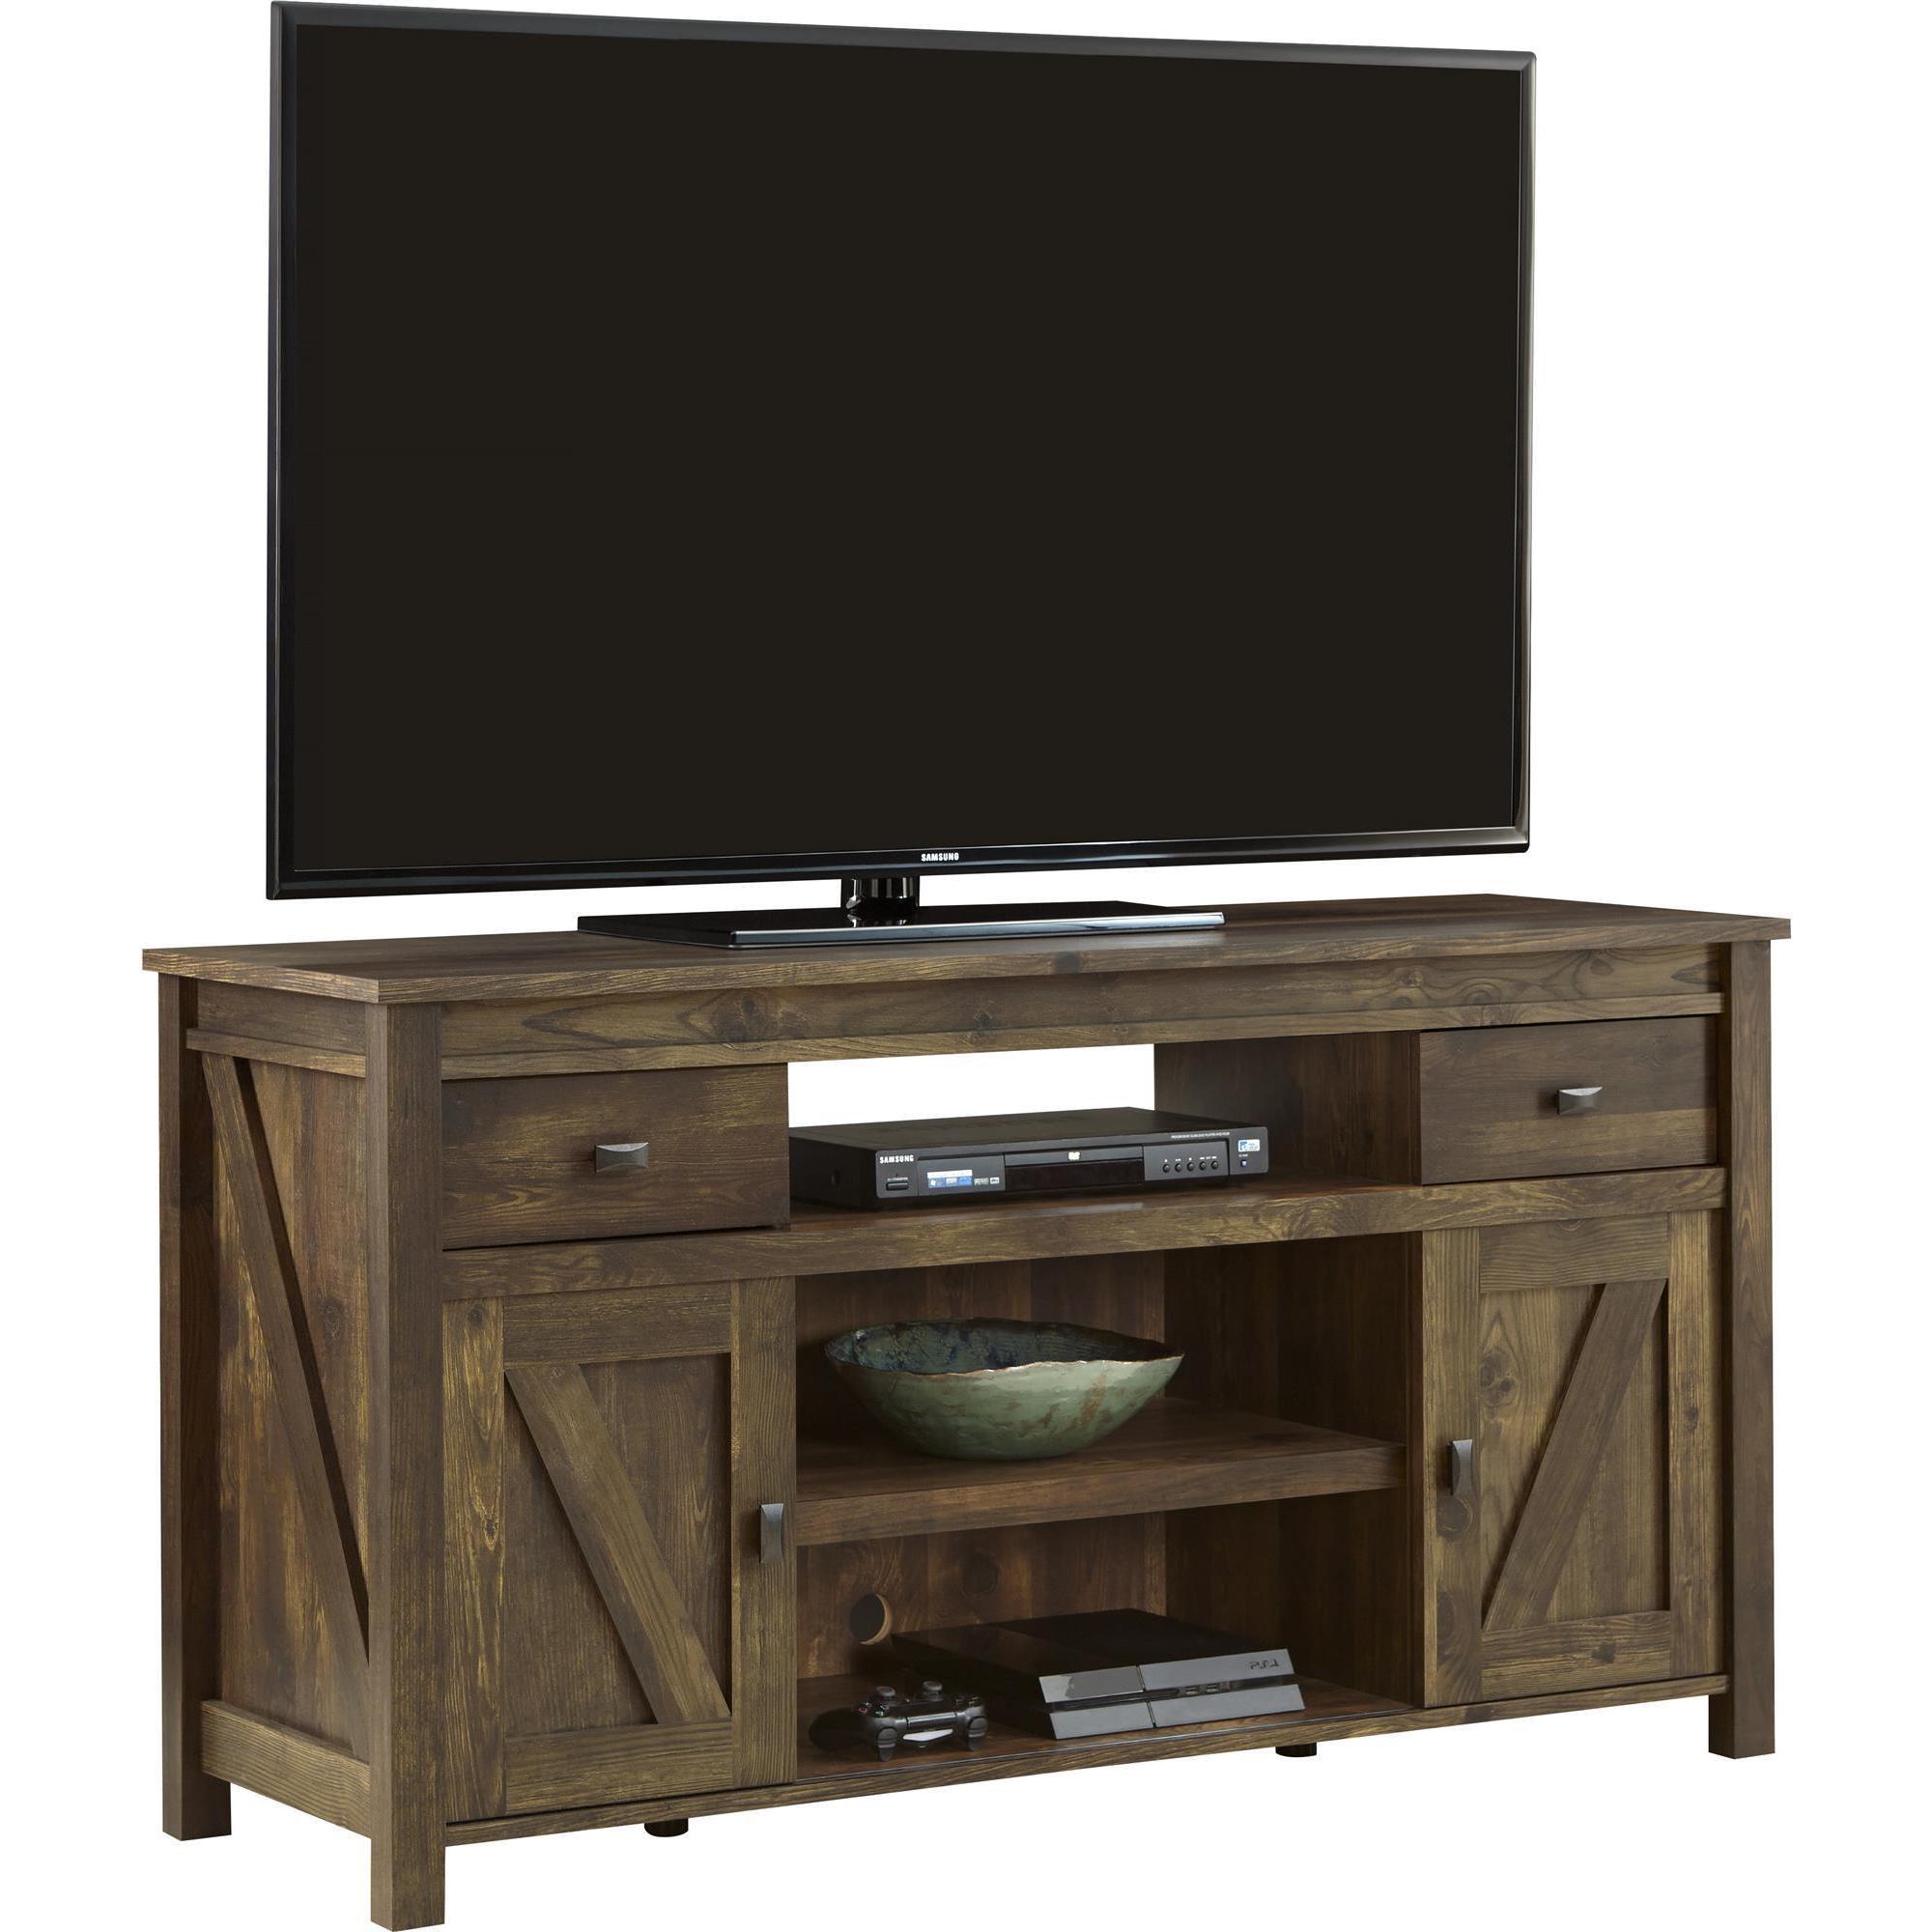 Shop The Gray Barn Latigo 60 Inch Tv Stand Free Shipping Today